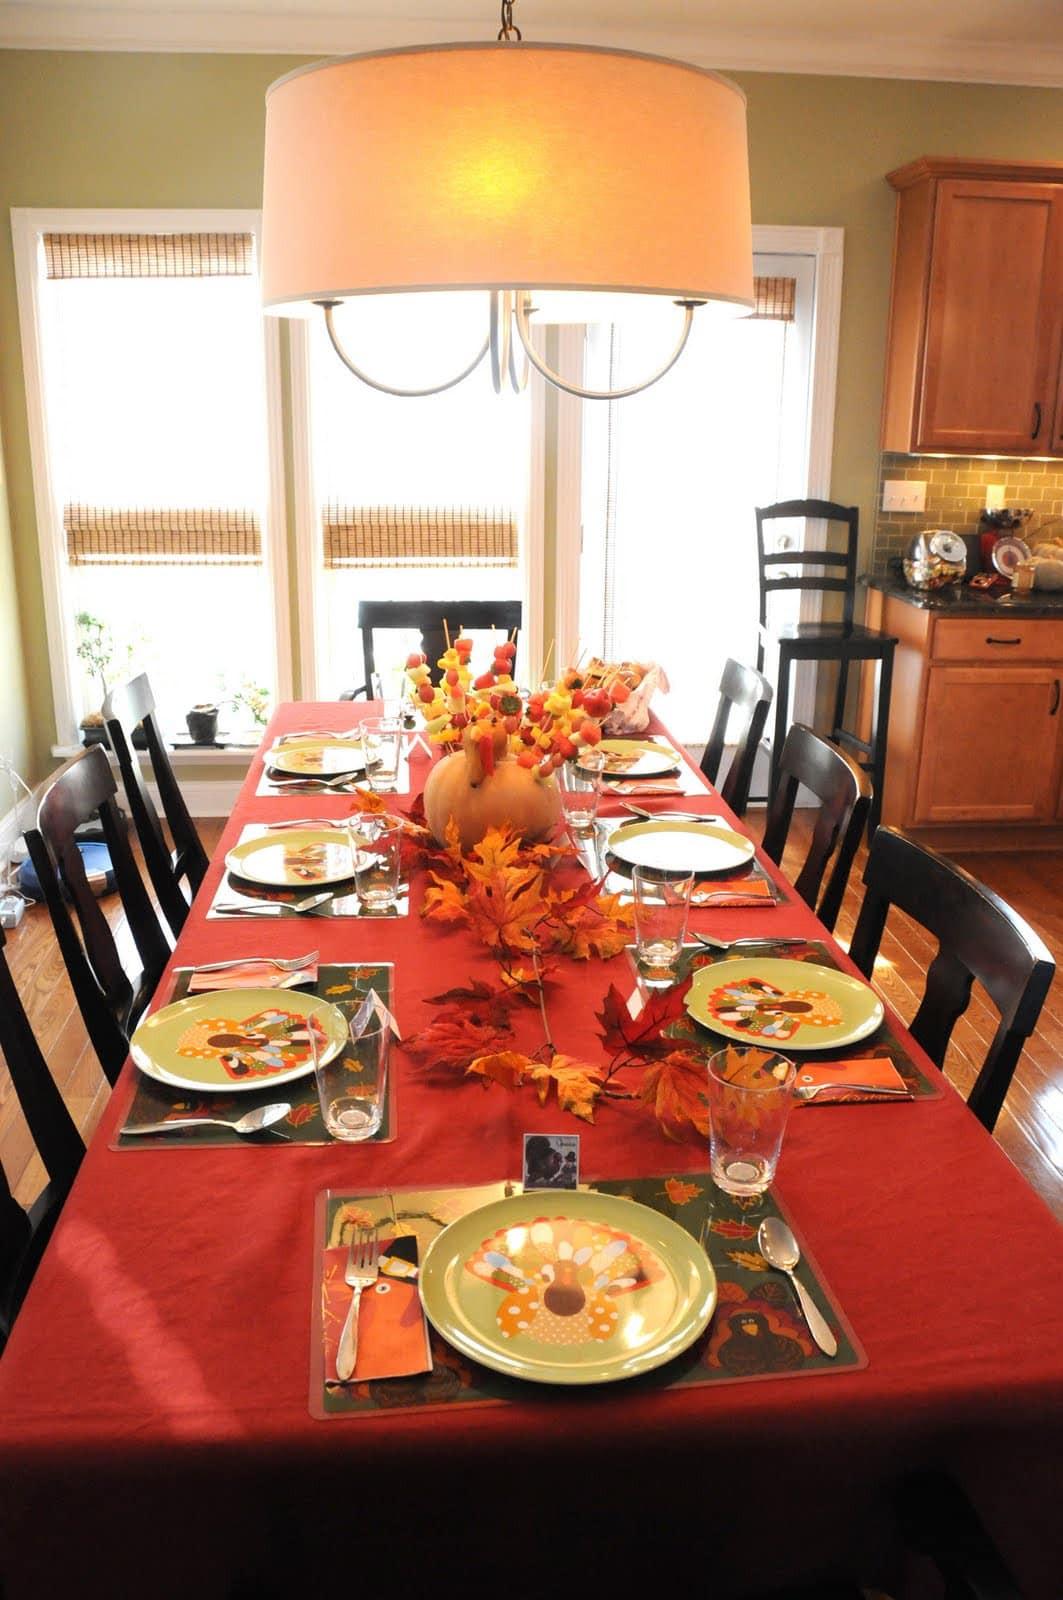 Thanksgiving Table Decor  Thanksgiving Decor The Polkadot Chair